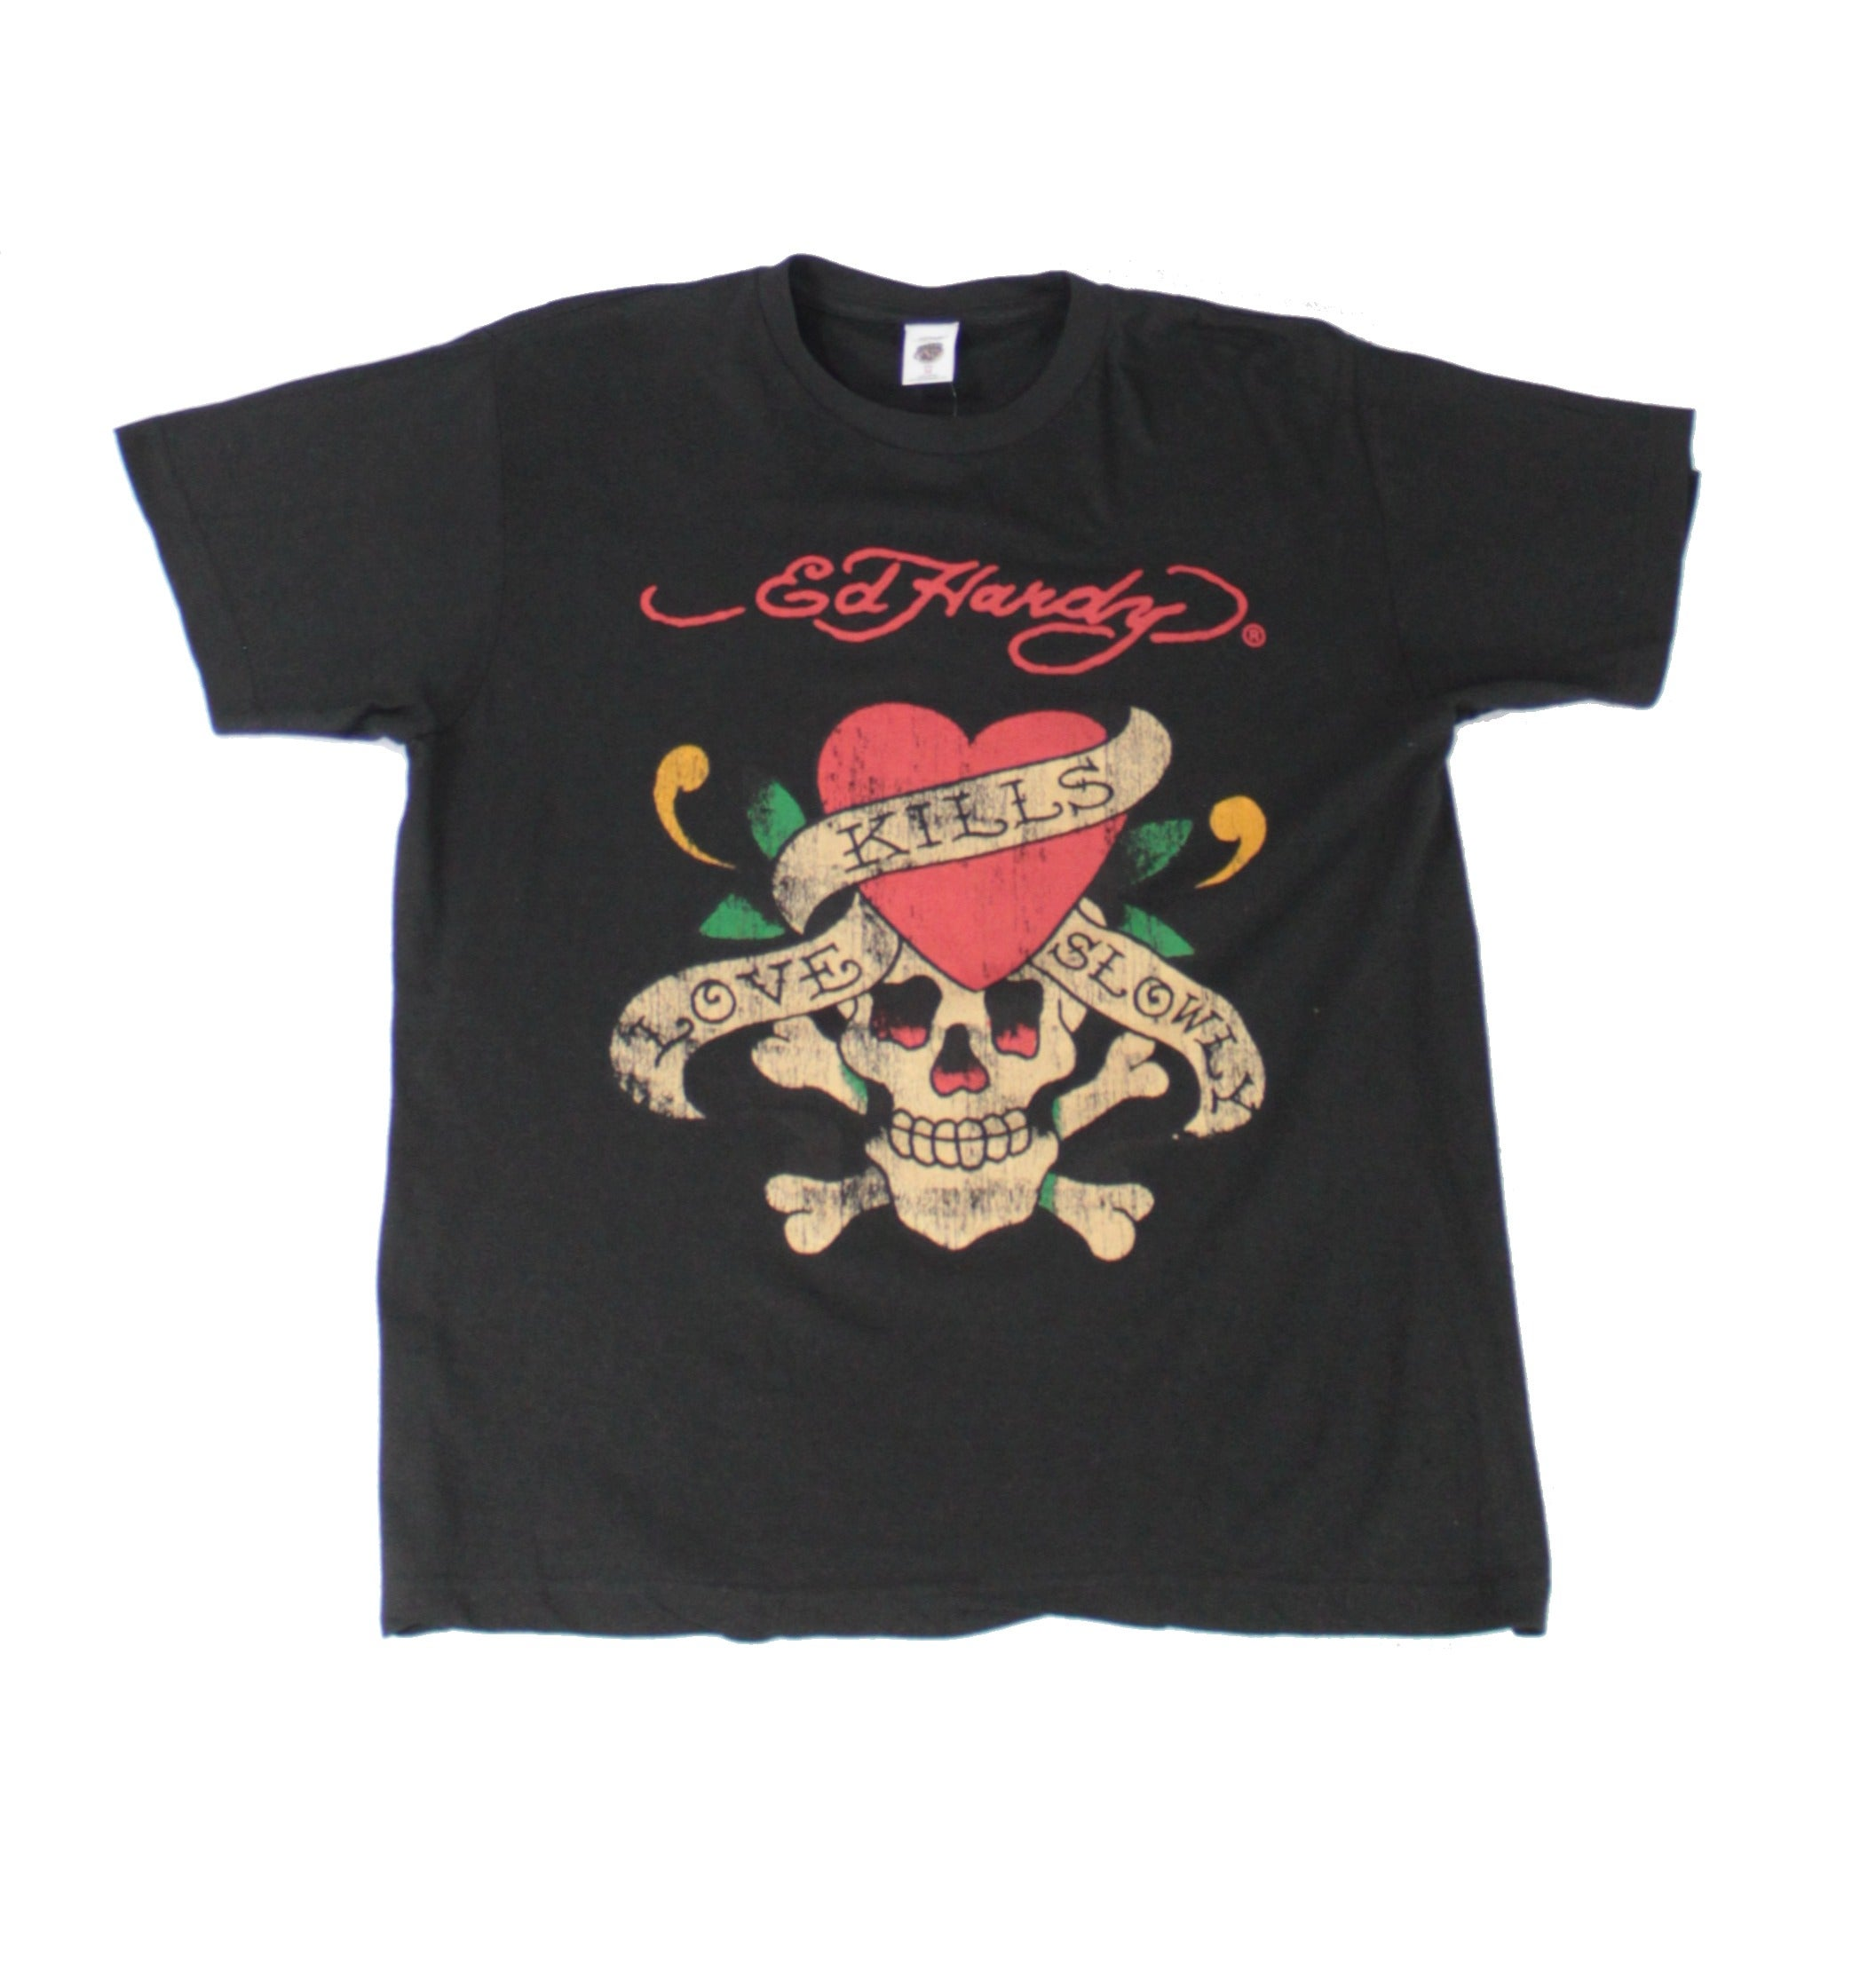 Ed Hardy Mens T-Shirt Black Size 2XL Crew Neck Love Kills Slowly Tee